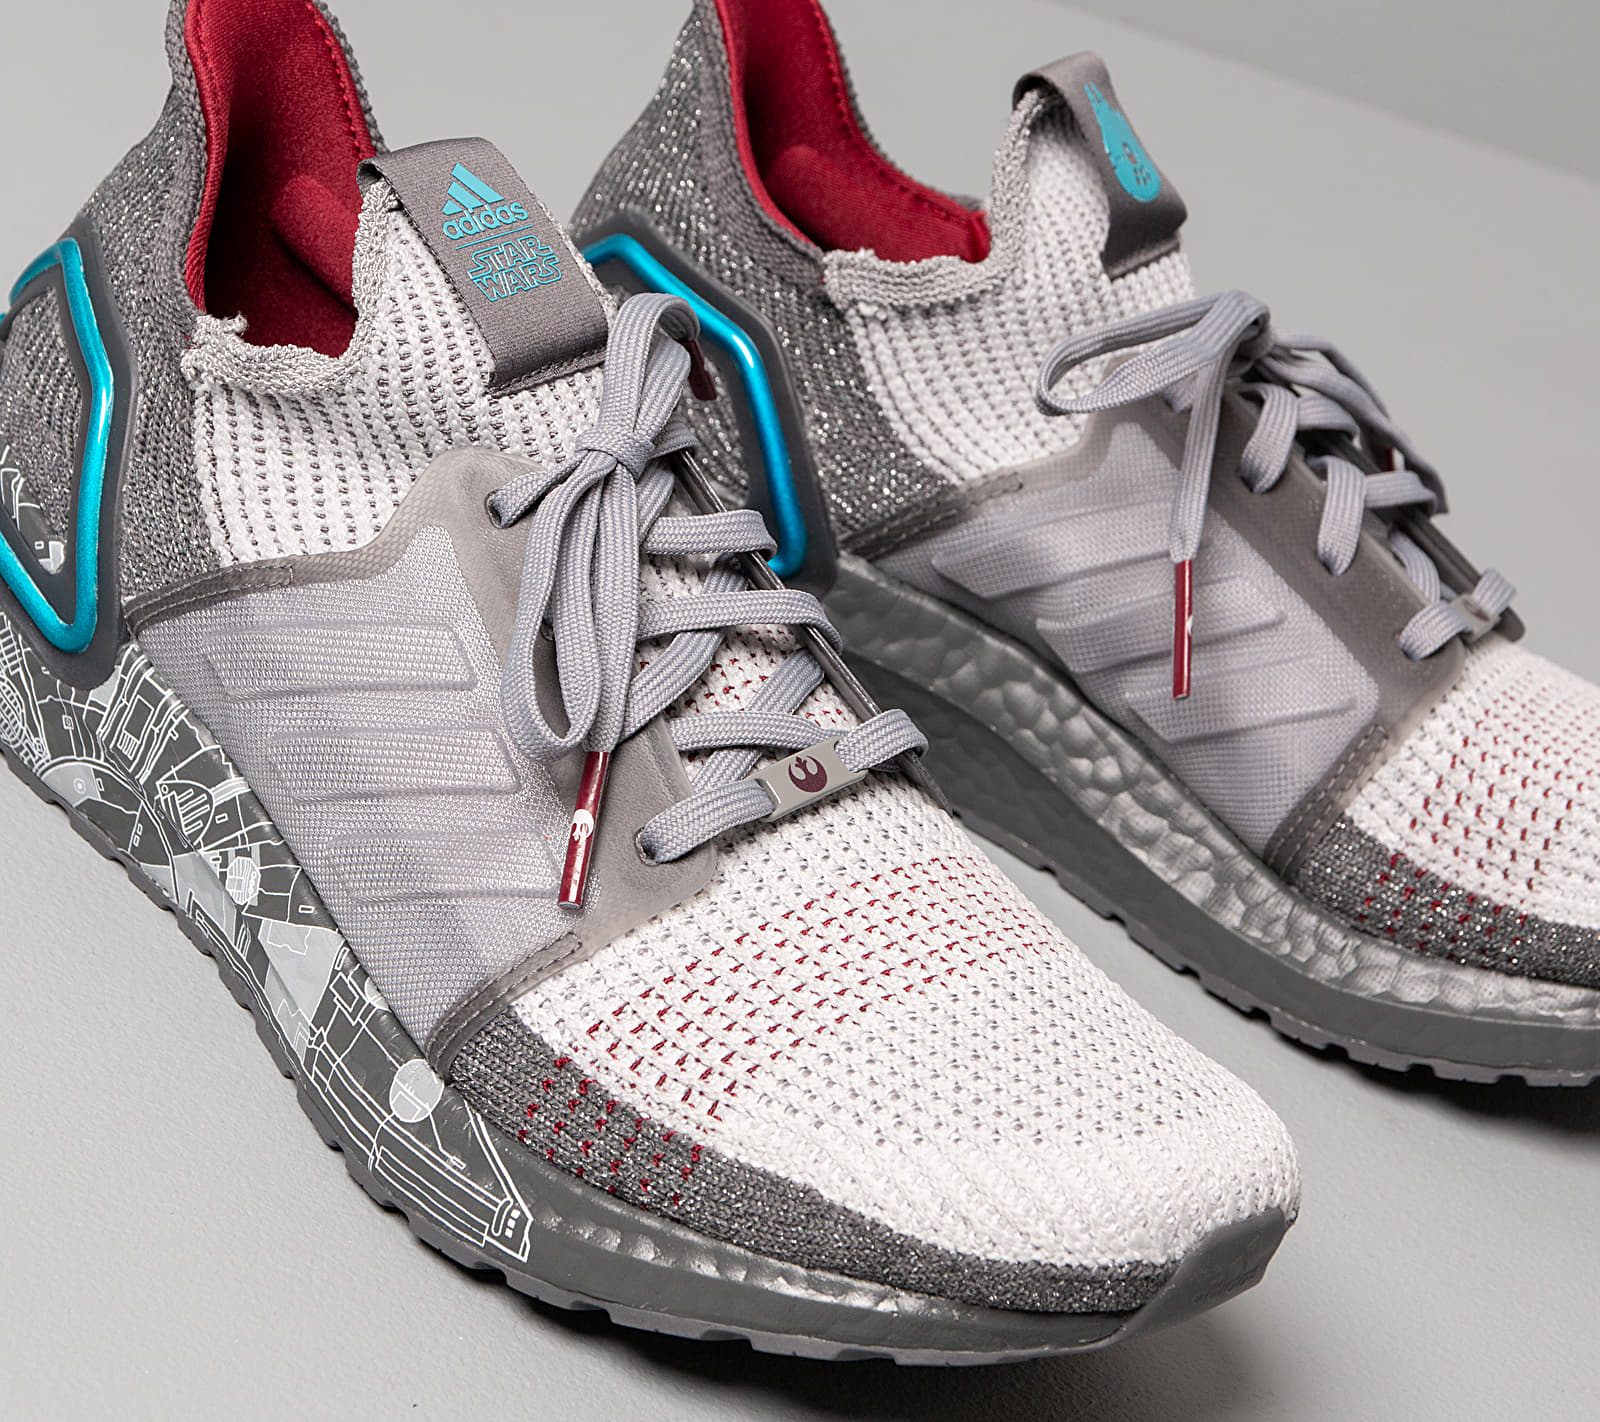 adidas x Star Wars UltraBOOST 19 Grey Five/ Grey Two F17/ Bright Cyan, Gray